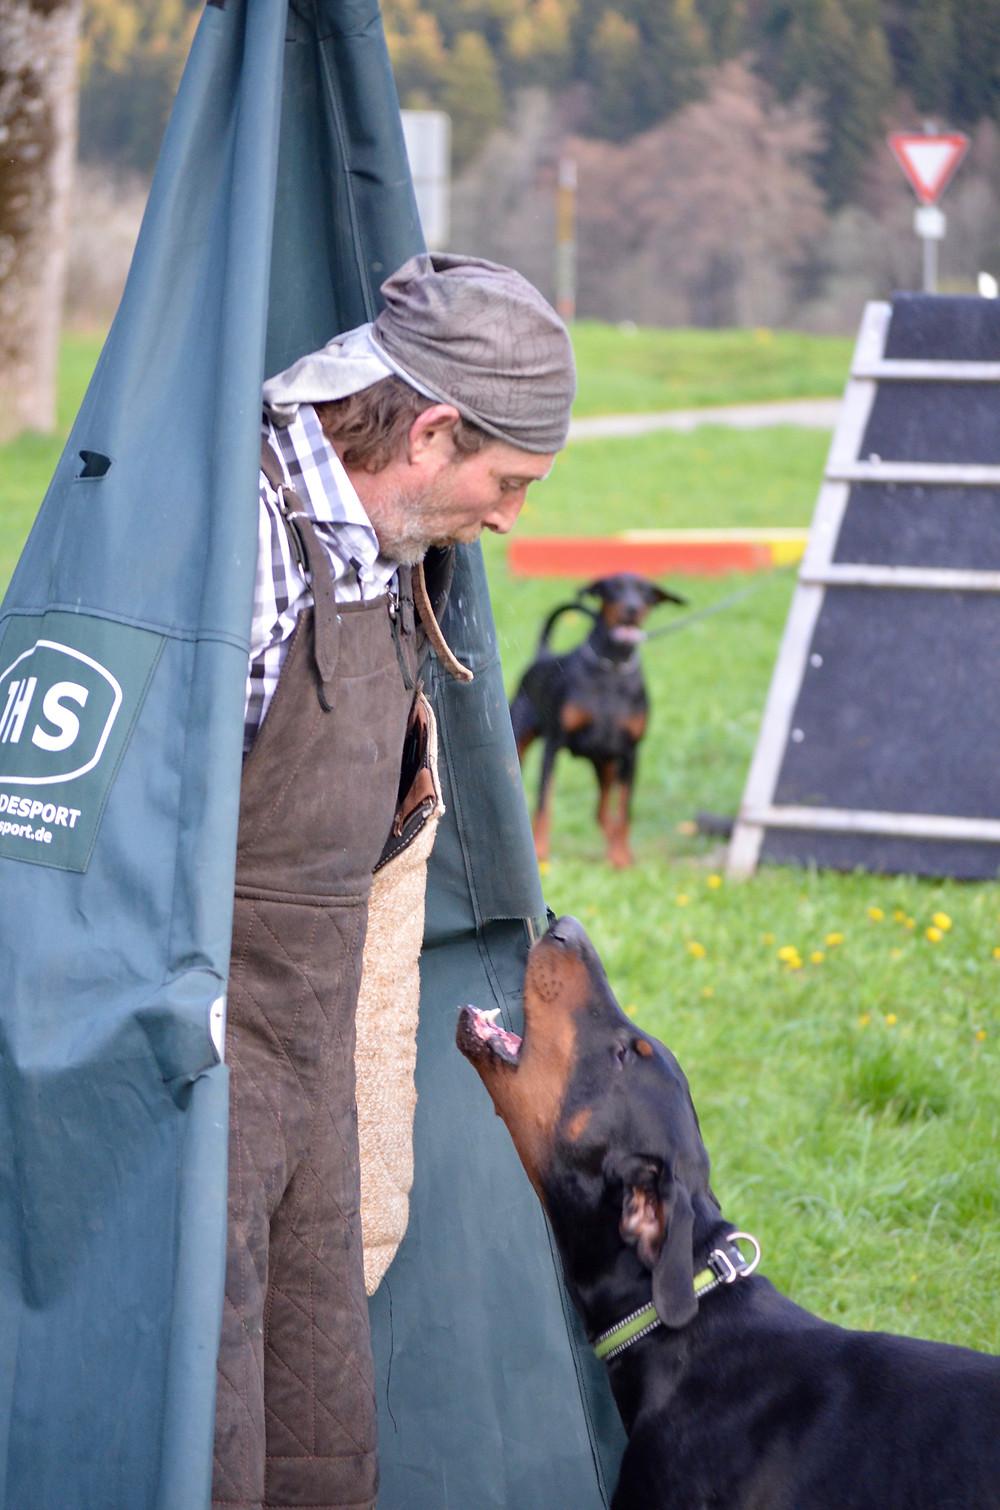 Hundesport IGP: Dobermann verbellt Person im Versteck